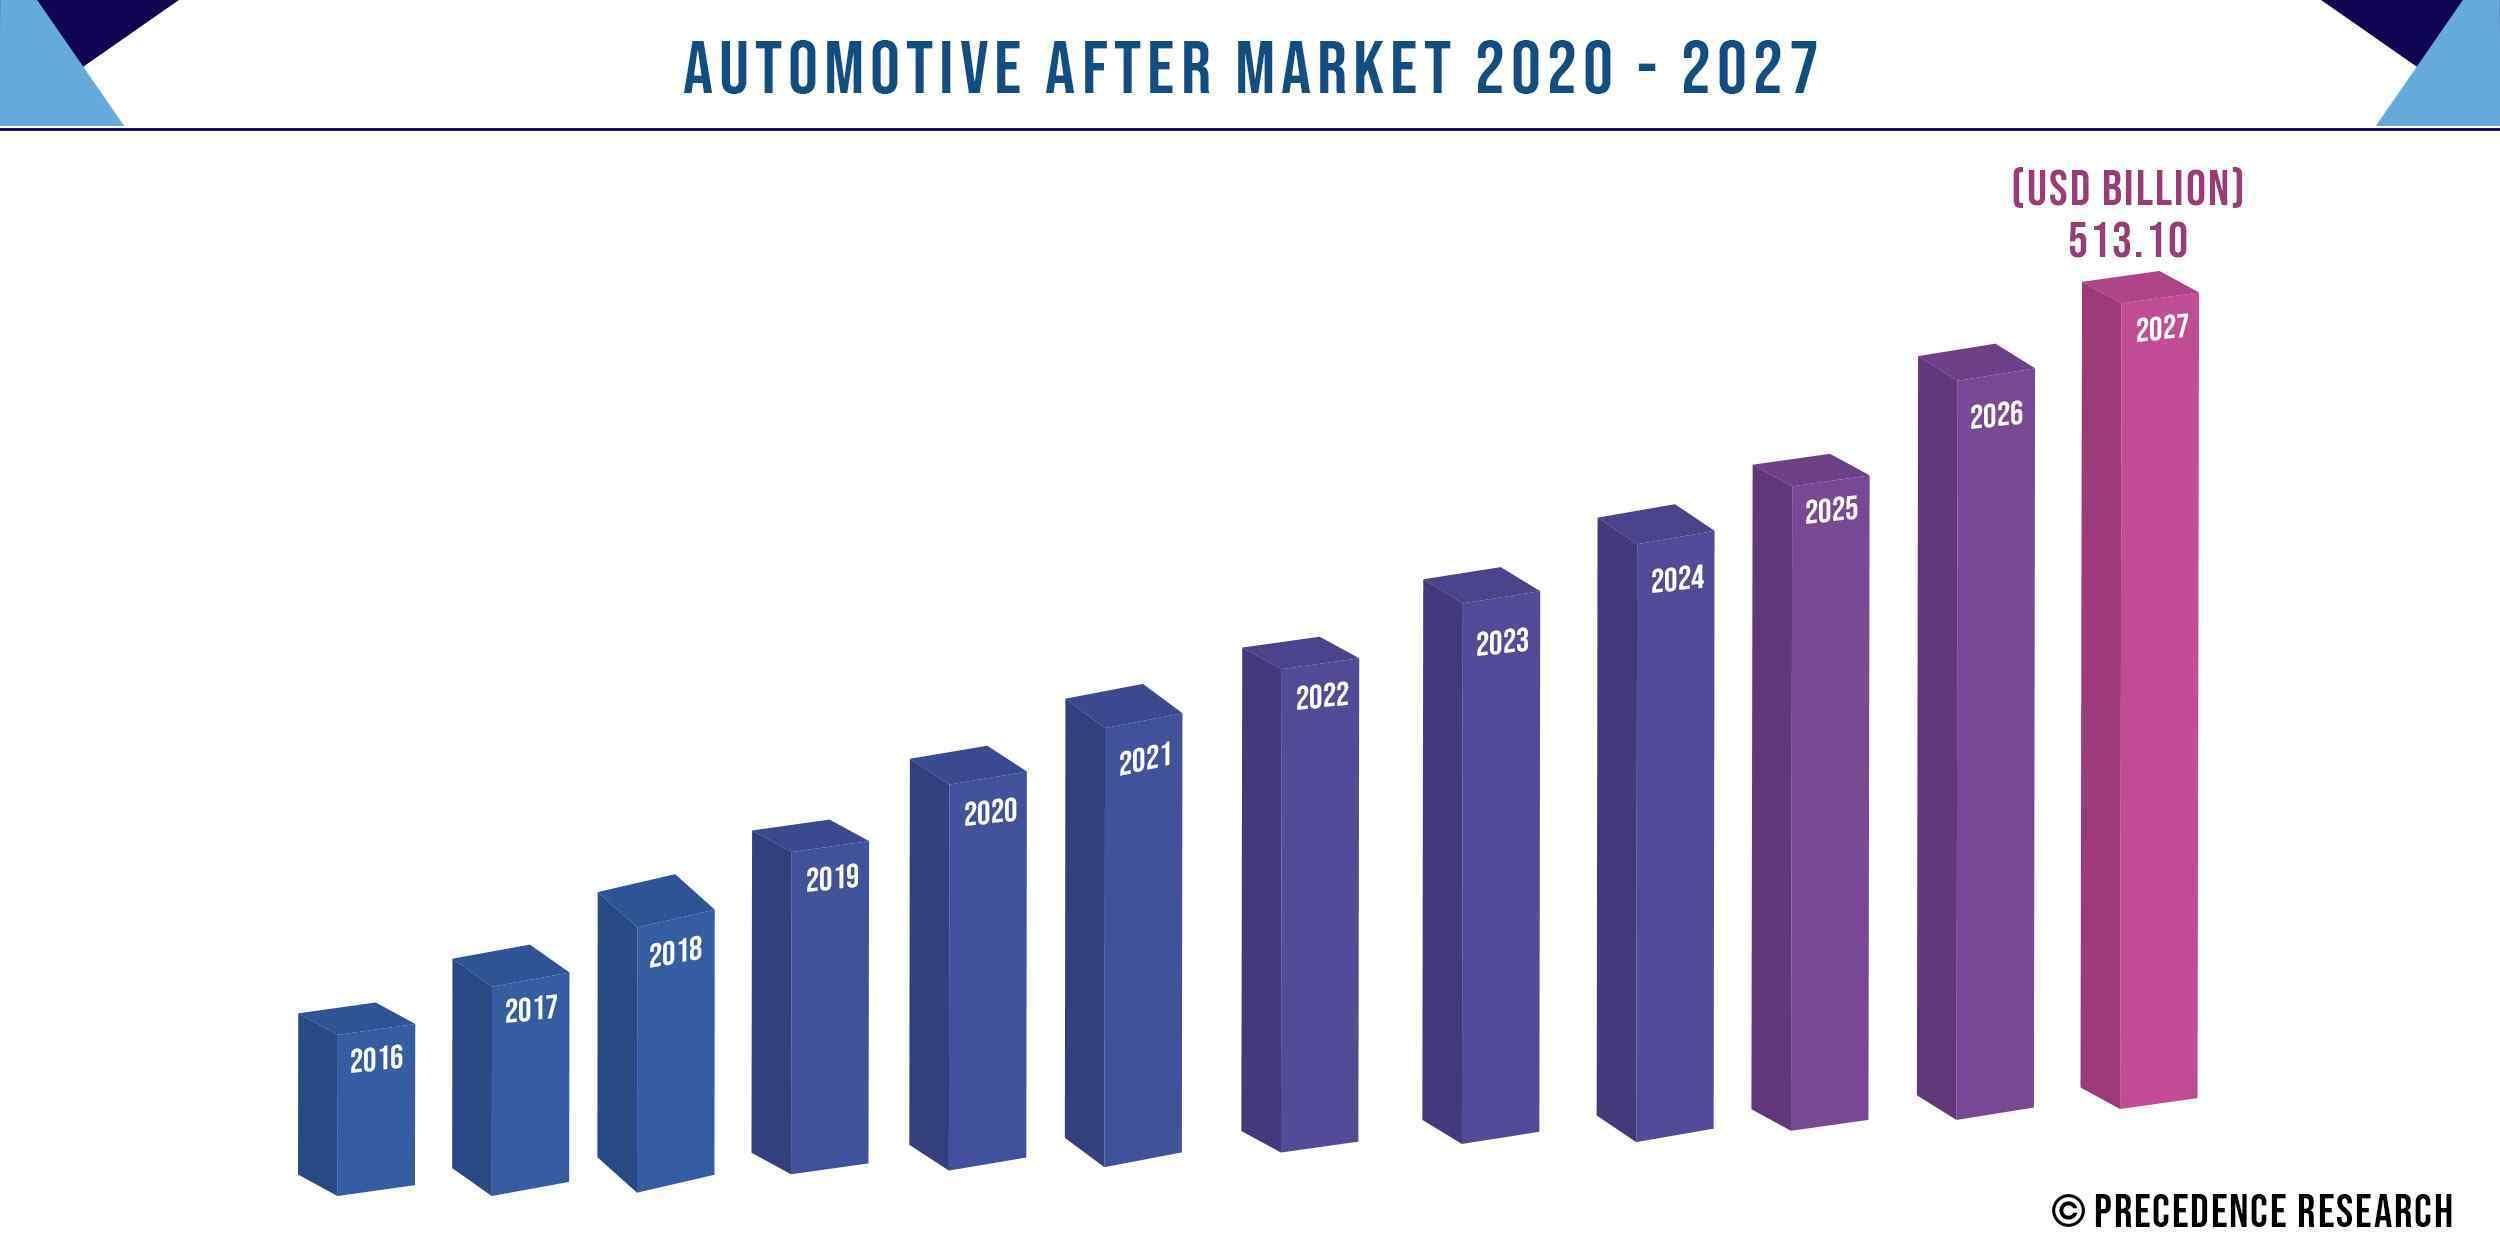 Automotive Aftermarket Size 2016-2027